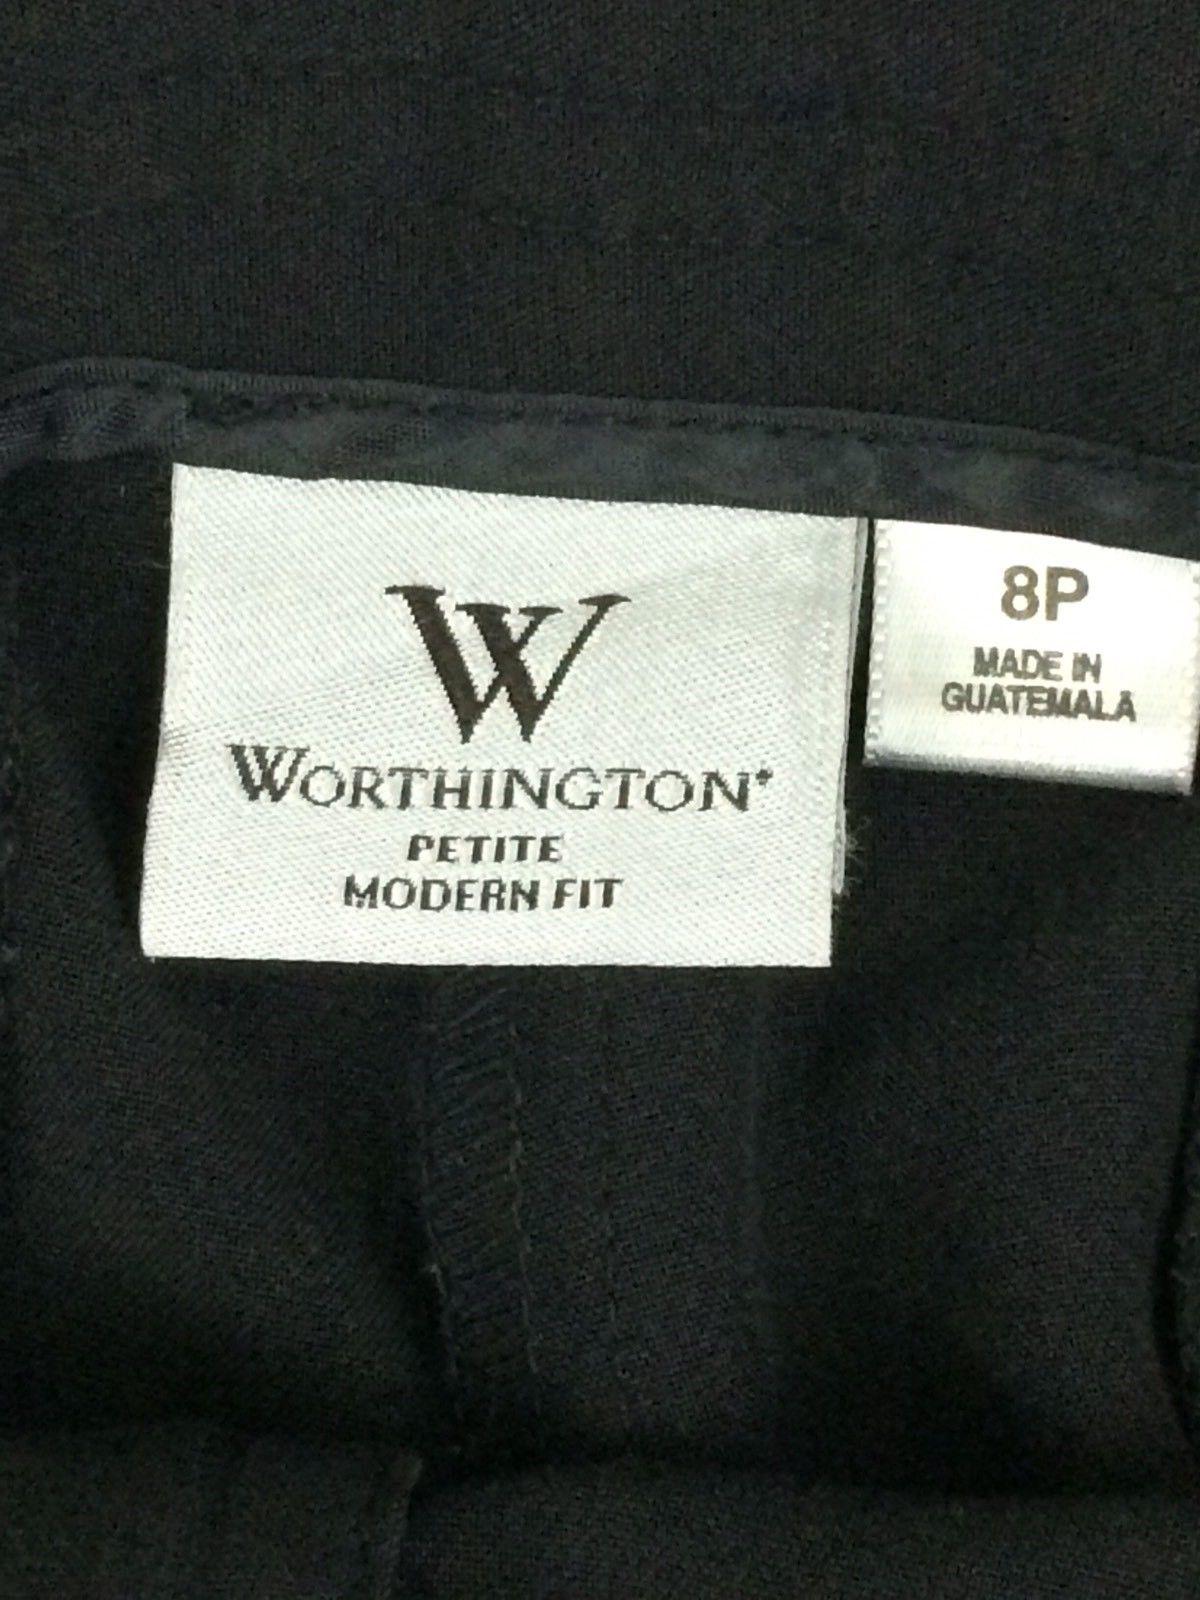 ... Worthington Modern Fit Petite Capri Pants Belted Stretch Crop Black 8P Career